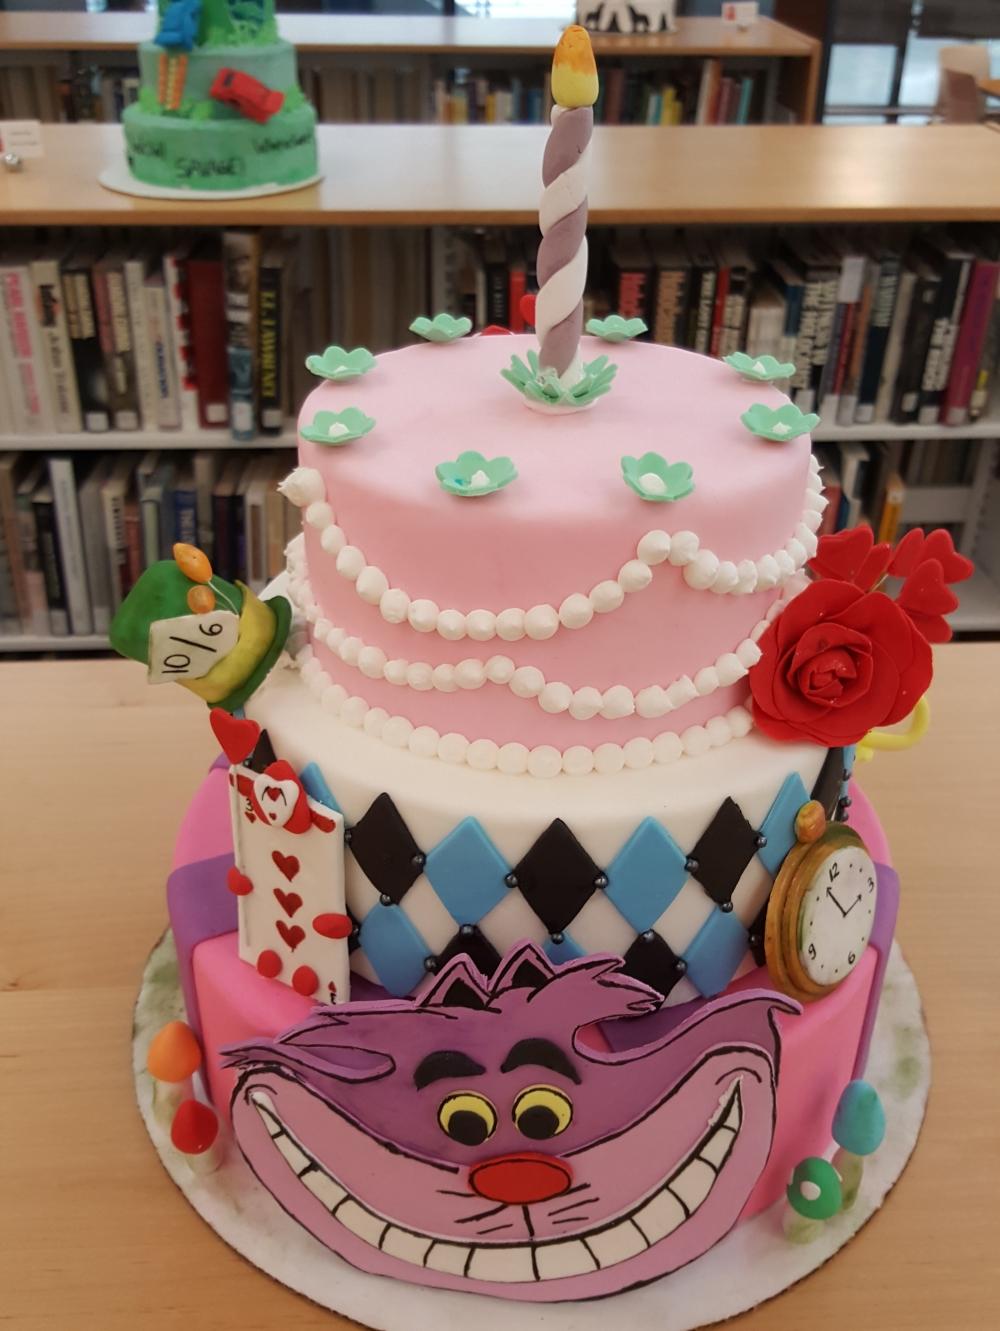 2019 Cakes Alice in Wonderland - top view